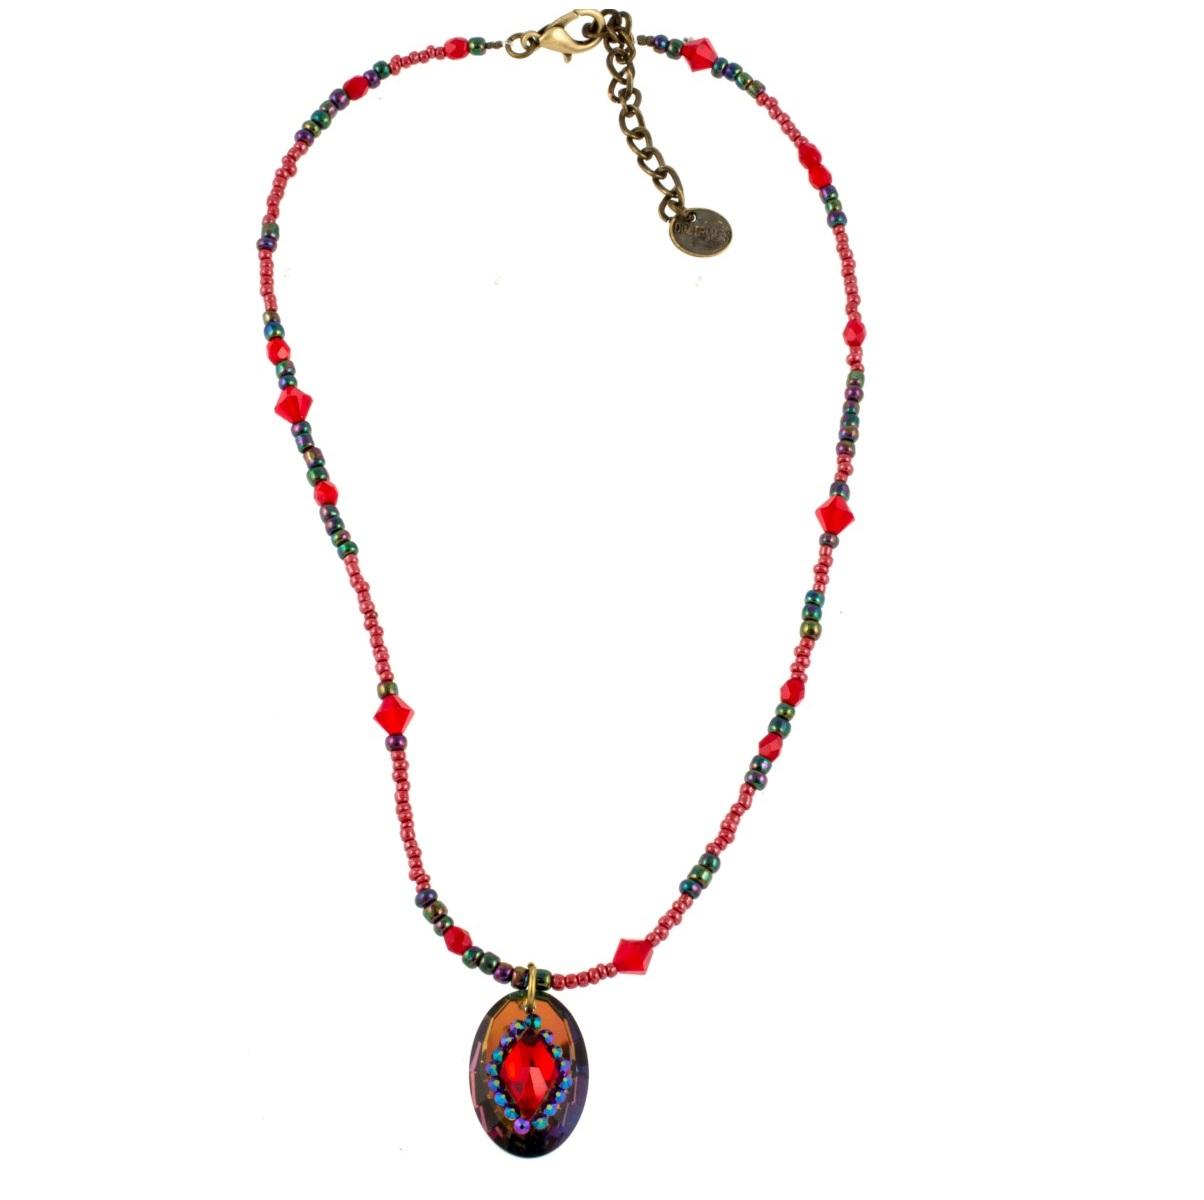 ARTWEAR DIMITRIADIS - Γυναικείο κολιέ ARTWEAR DIMITRIADIS με πολύχρωμες χάντρες  γυναικεία αξεσουάρ κοσμήματα κολιέ